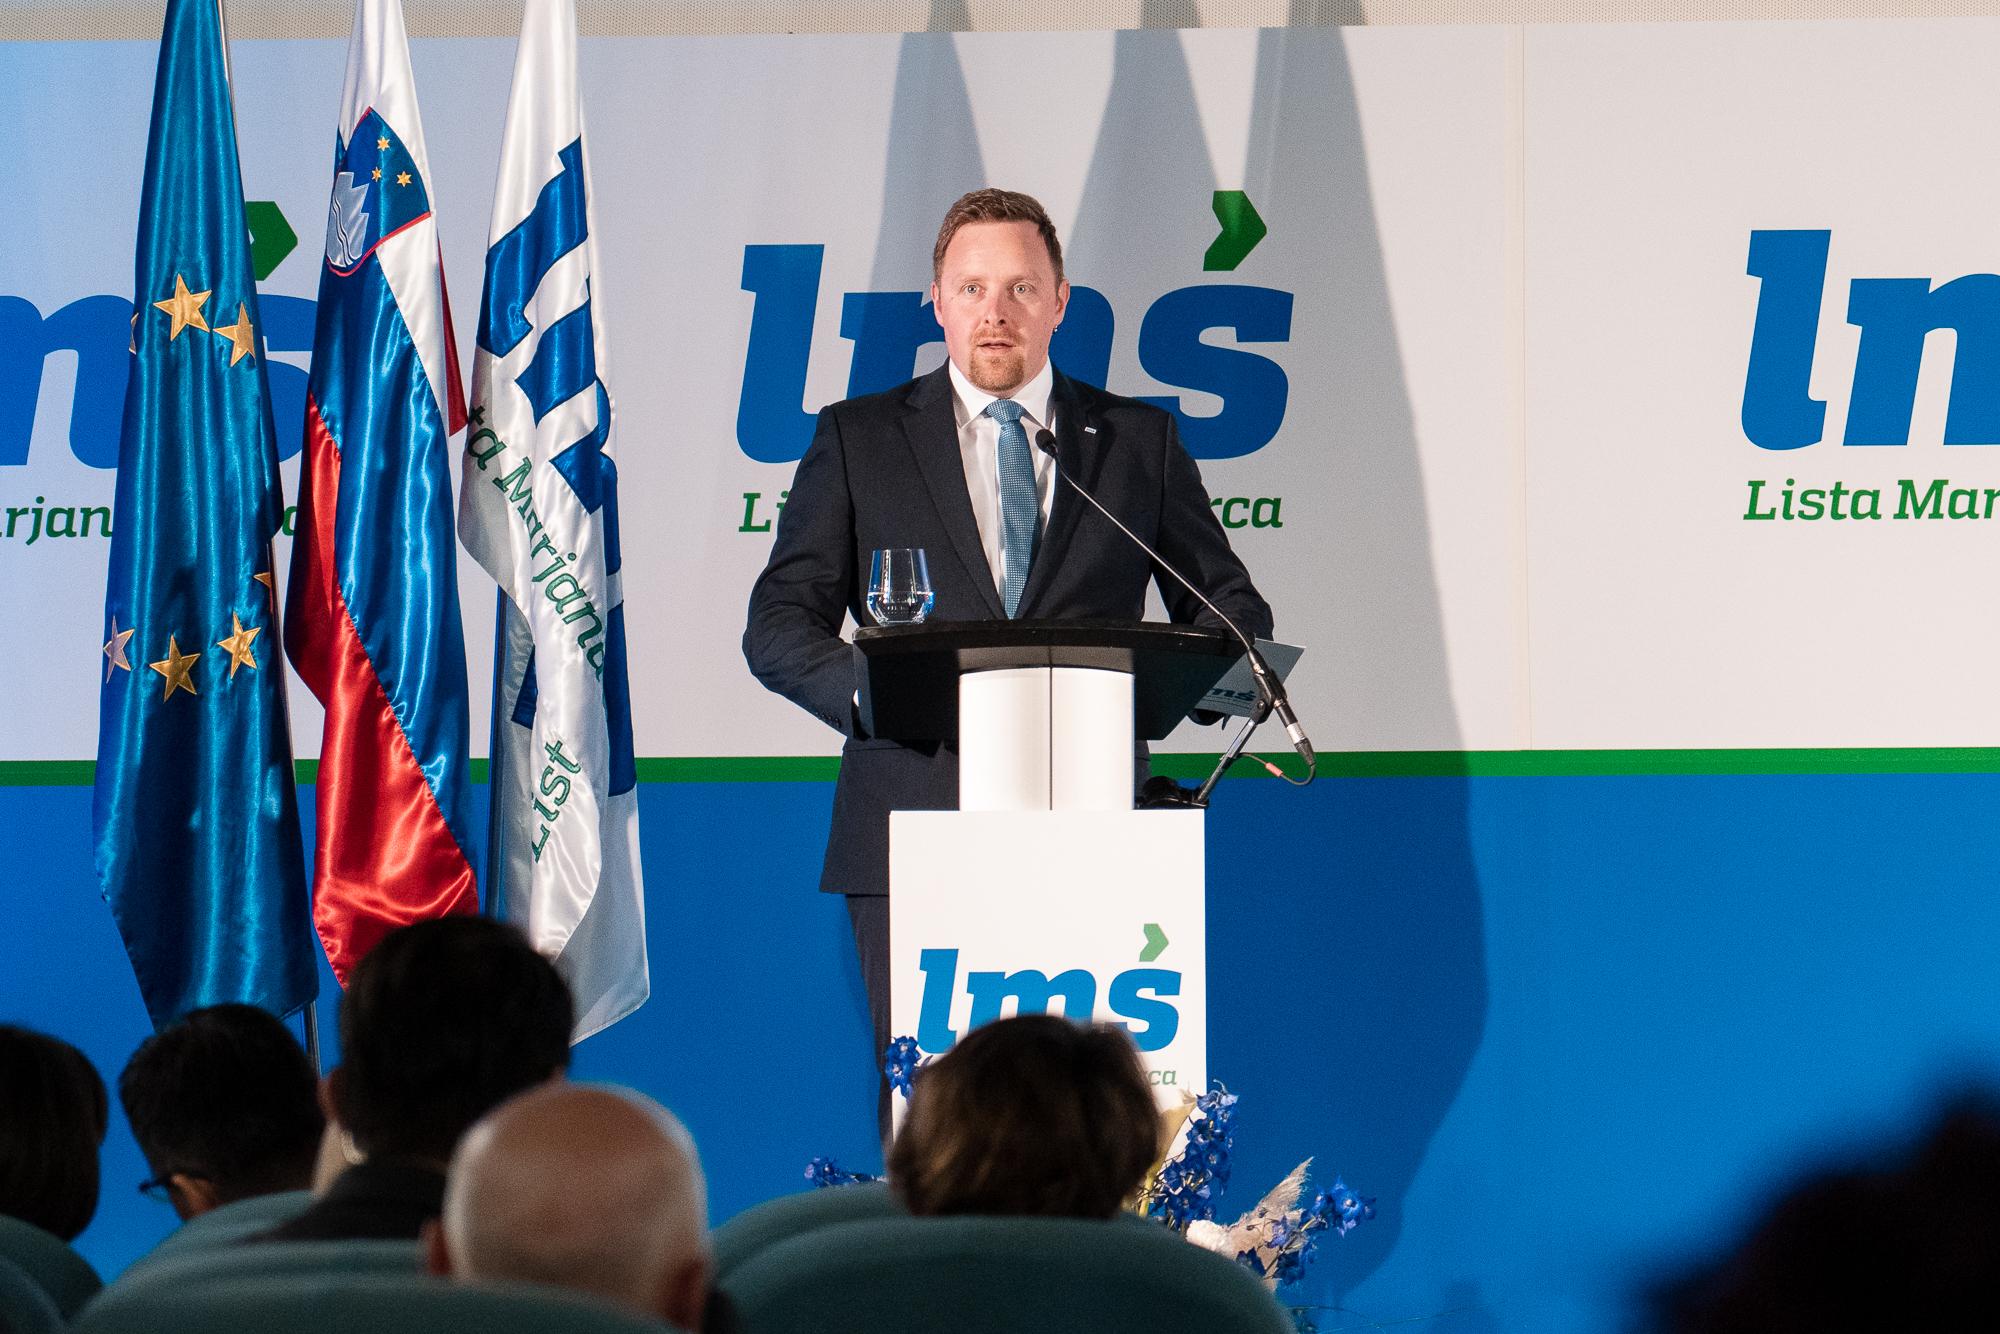 Igor Žavbi, vice president of Lista Marjana Šarca, on the stage at the Fifth Congress of LMŠ